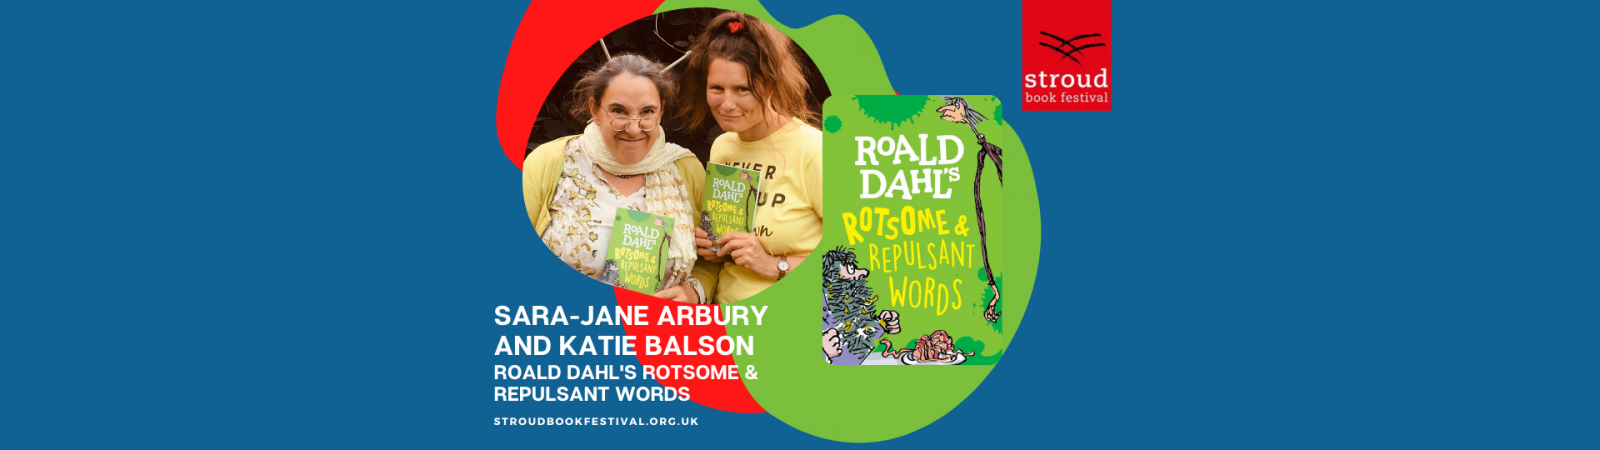 Sara-Jane Arbury and Katie Balson, Roald Dahl's Rotsome And Repulsant Words